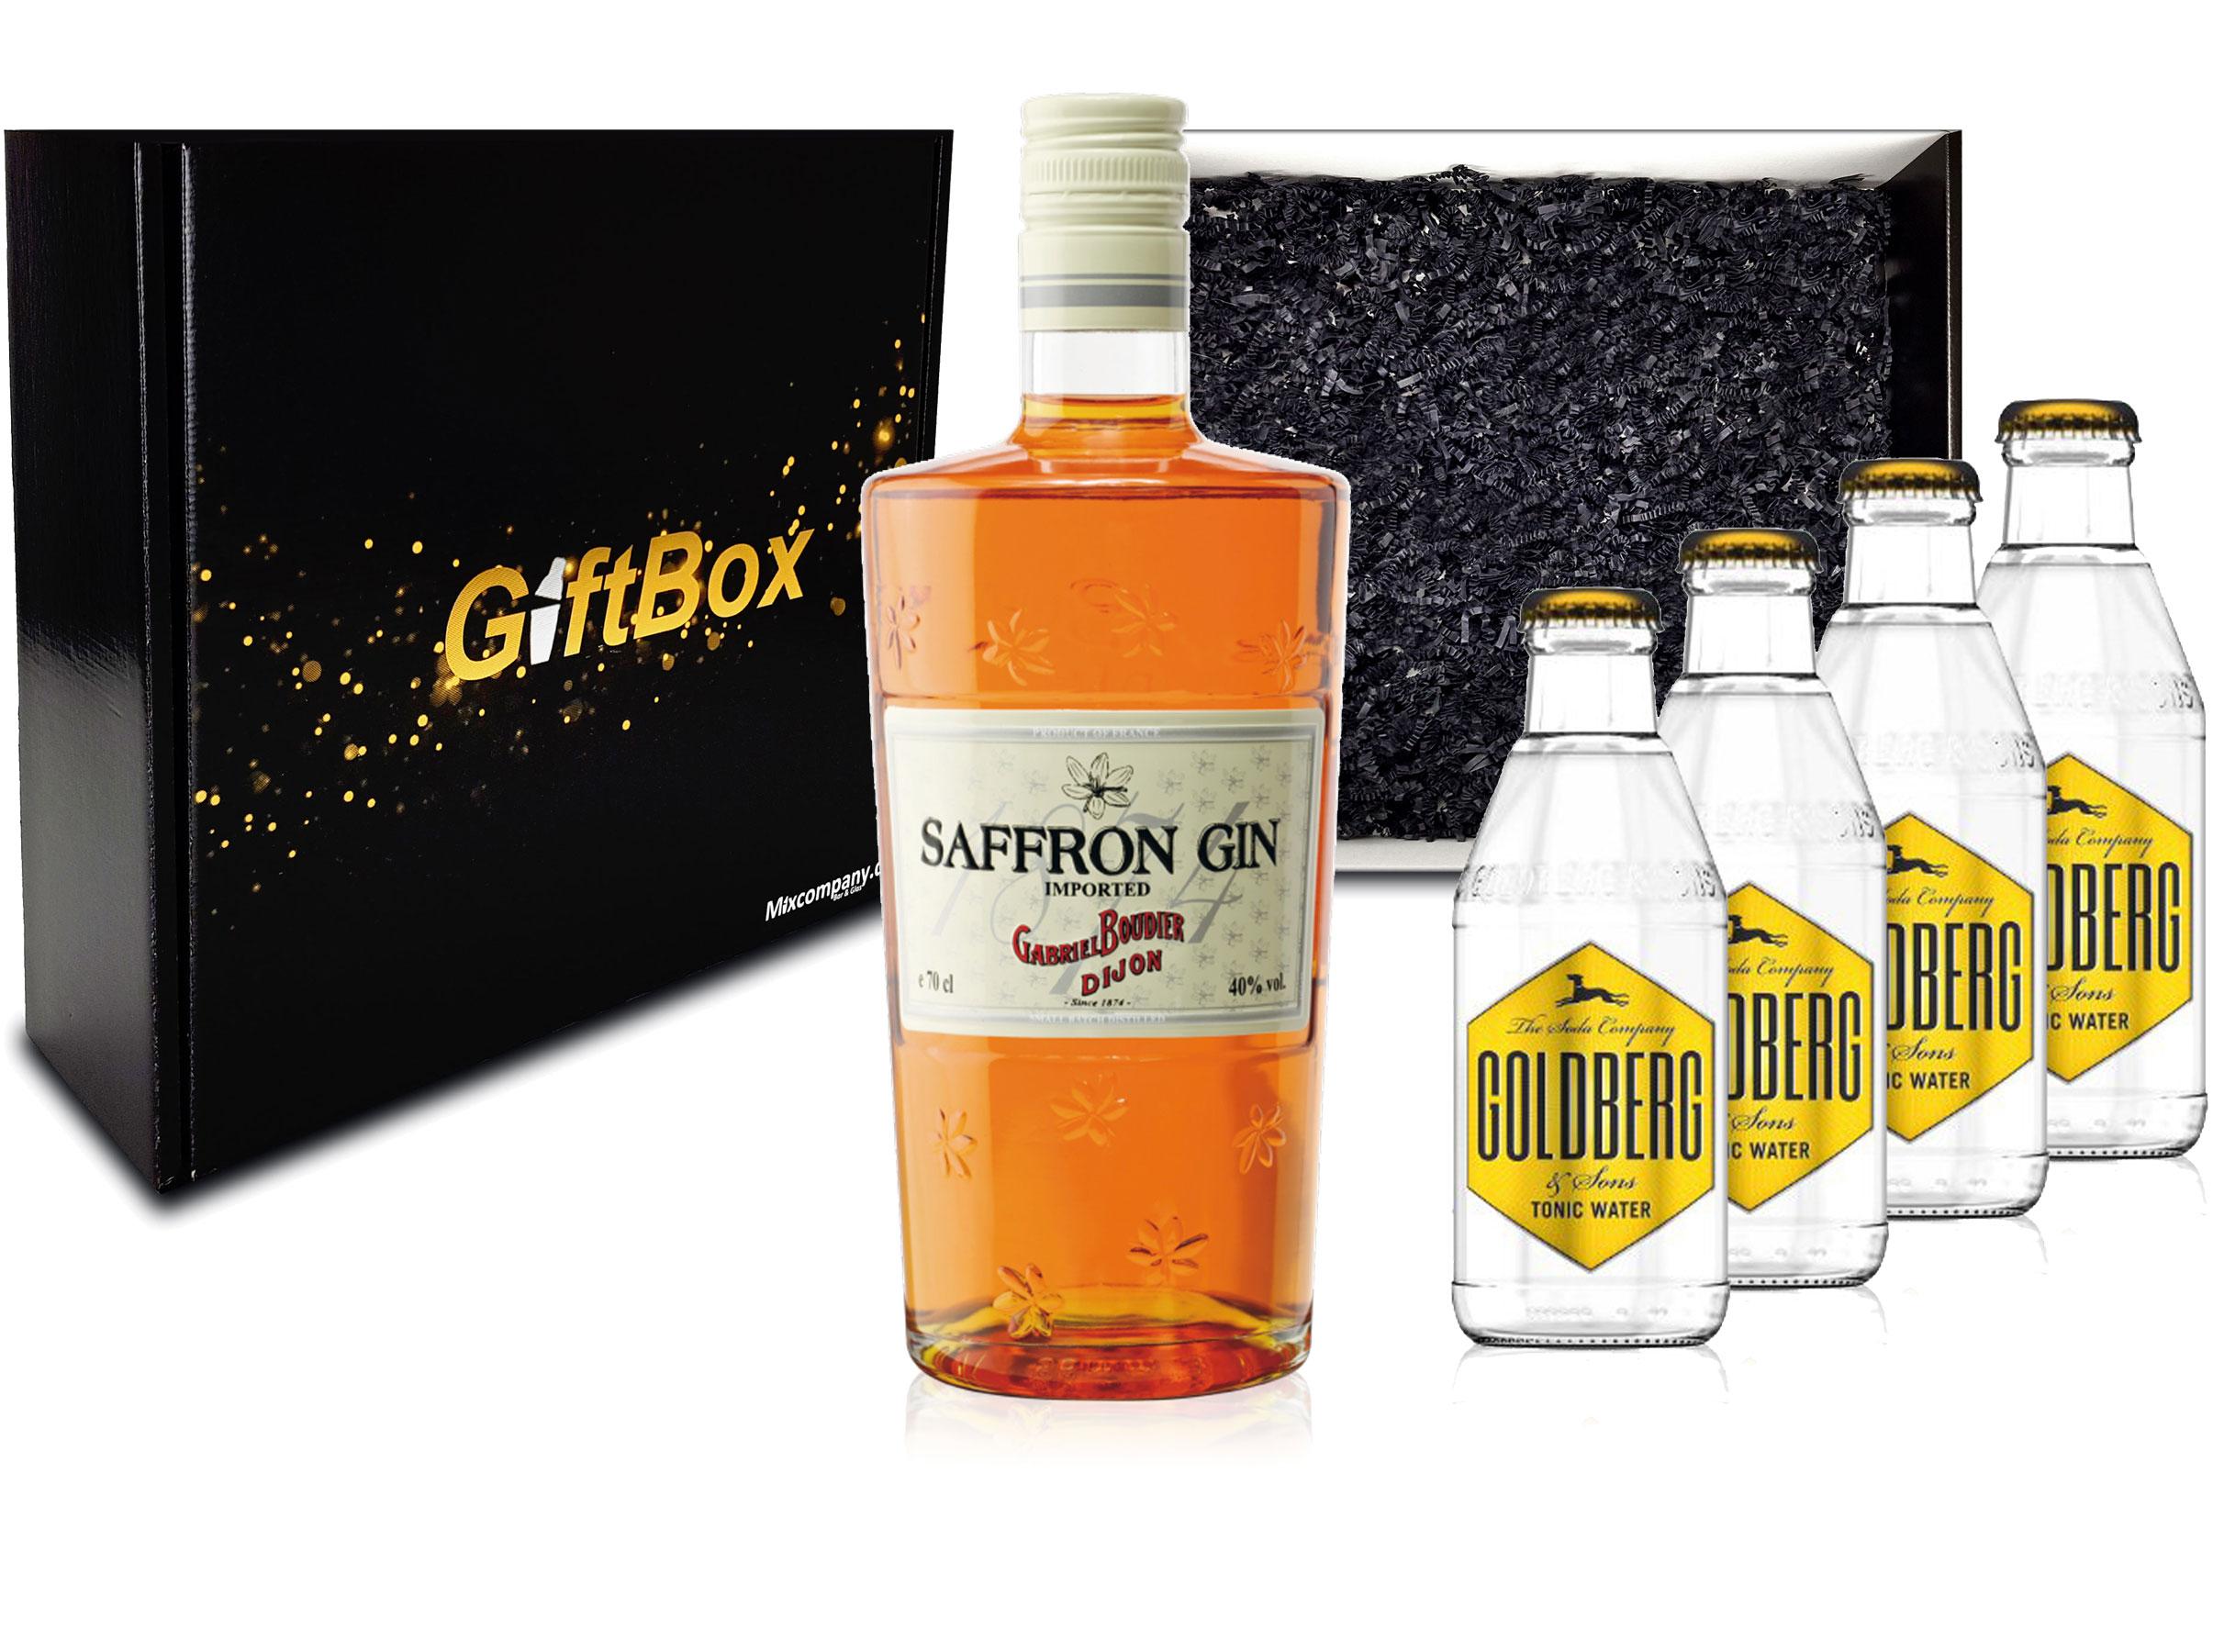 Gin Tonic Giftbox Geschenkset - Saffron Gin 0,7l 700ml (40% Vol) + 4x Goldberg Tonic Water 200ml inkl. Pfand MEHRWEG + Geschenkverpackung